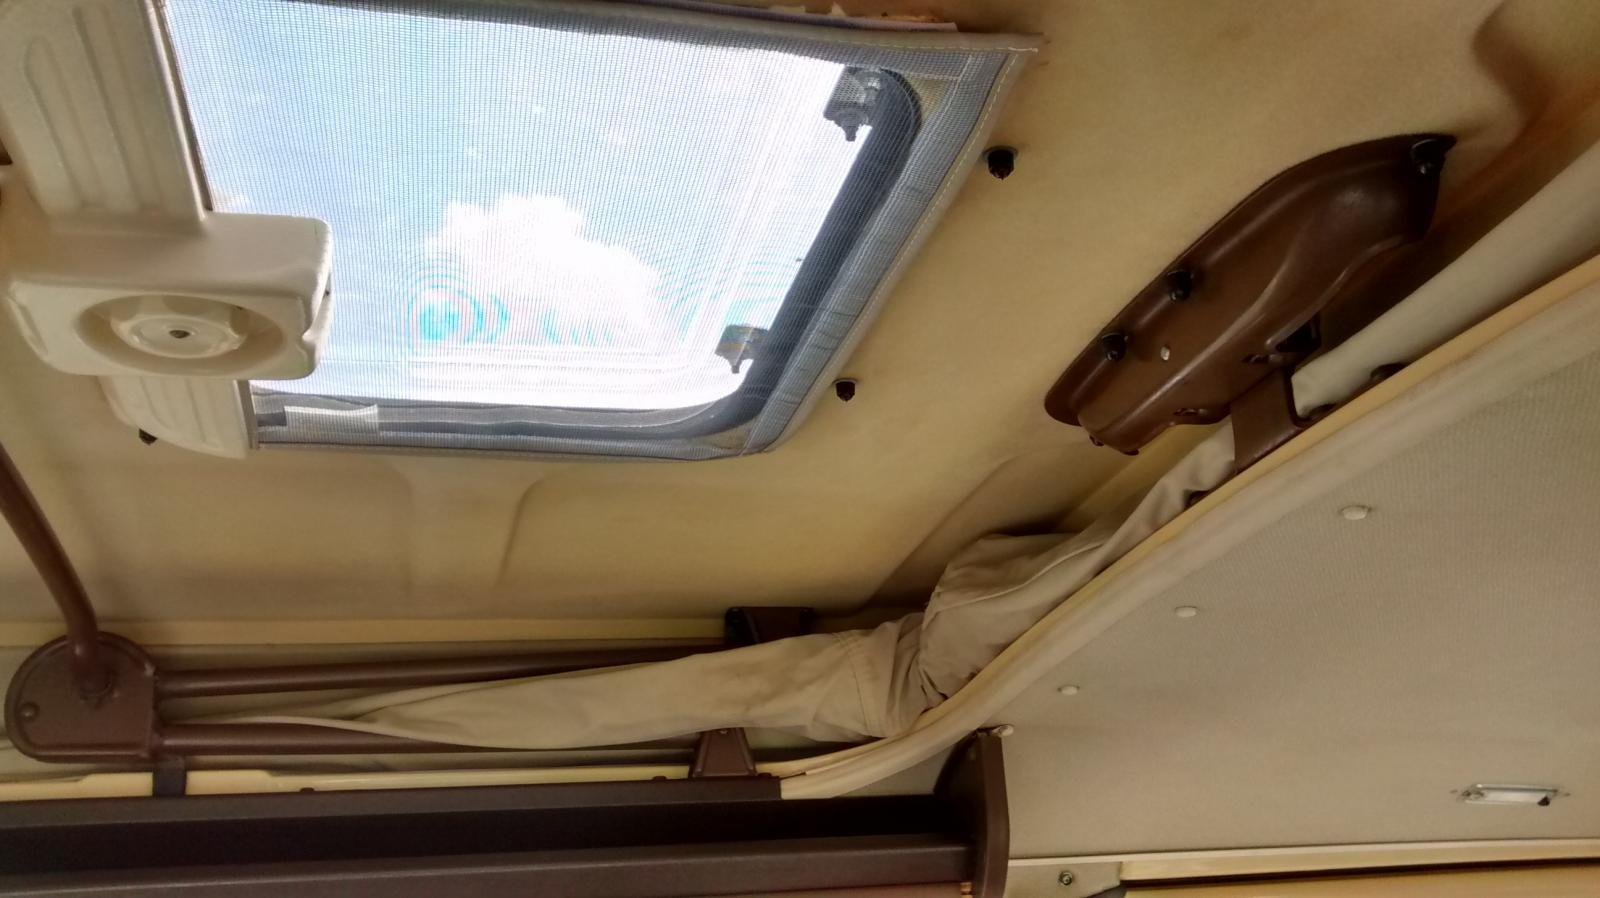 new screen for Westfalia skylight - no flap